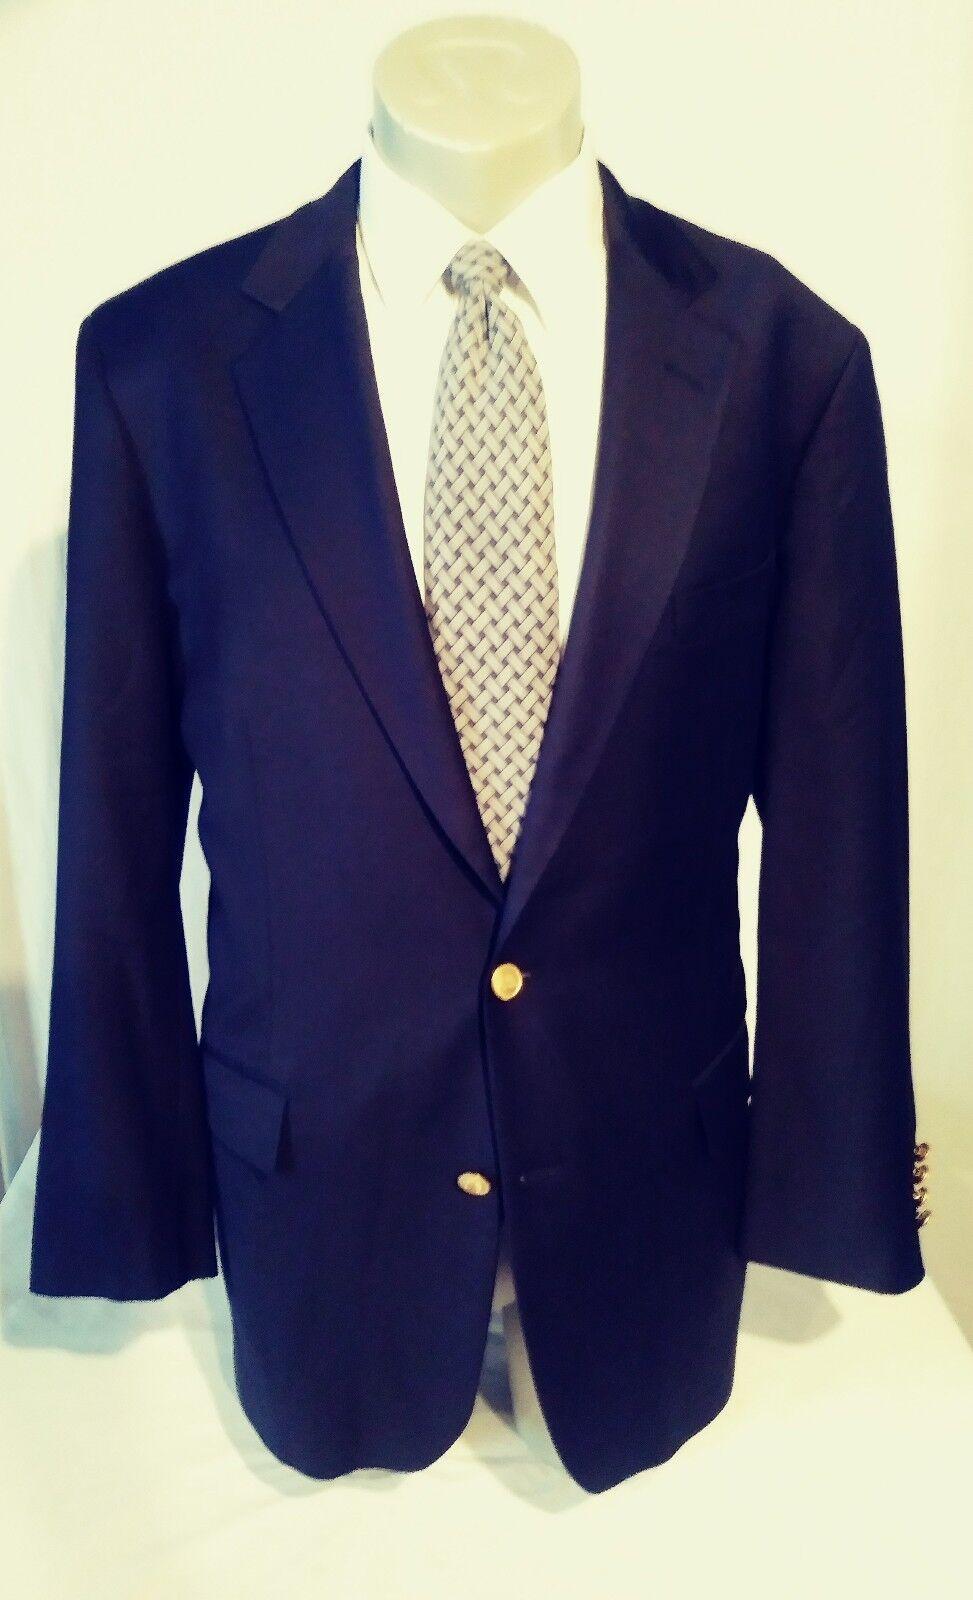 Mens Brlooks Bredhers Ing Lgold Piana &  navy bluee sports blazer sz 42L